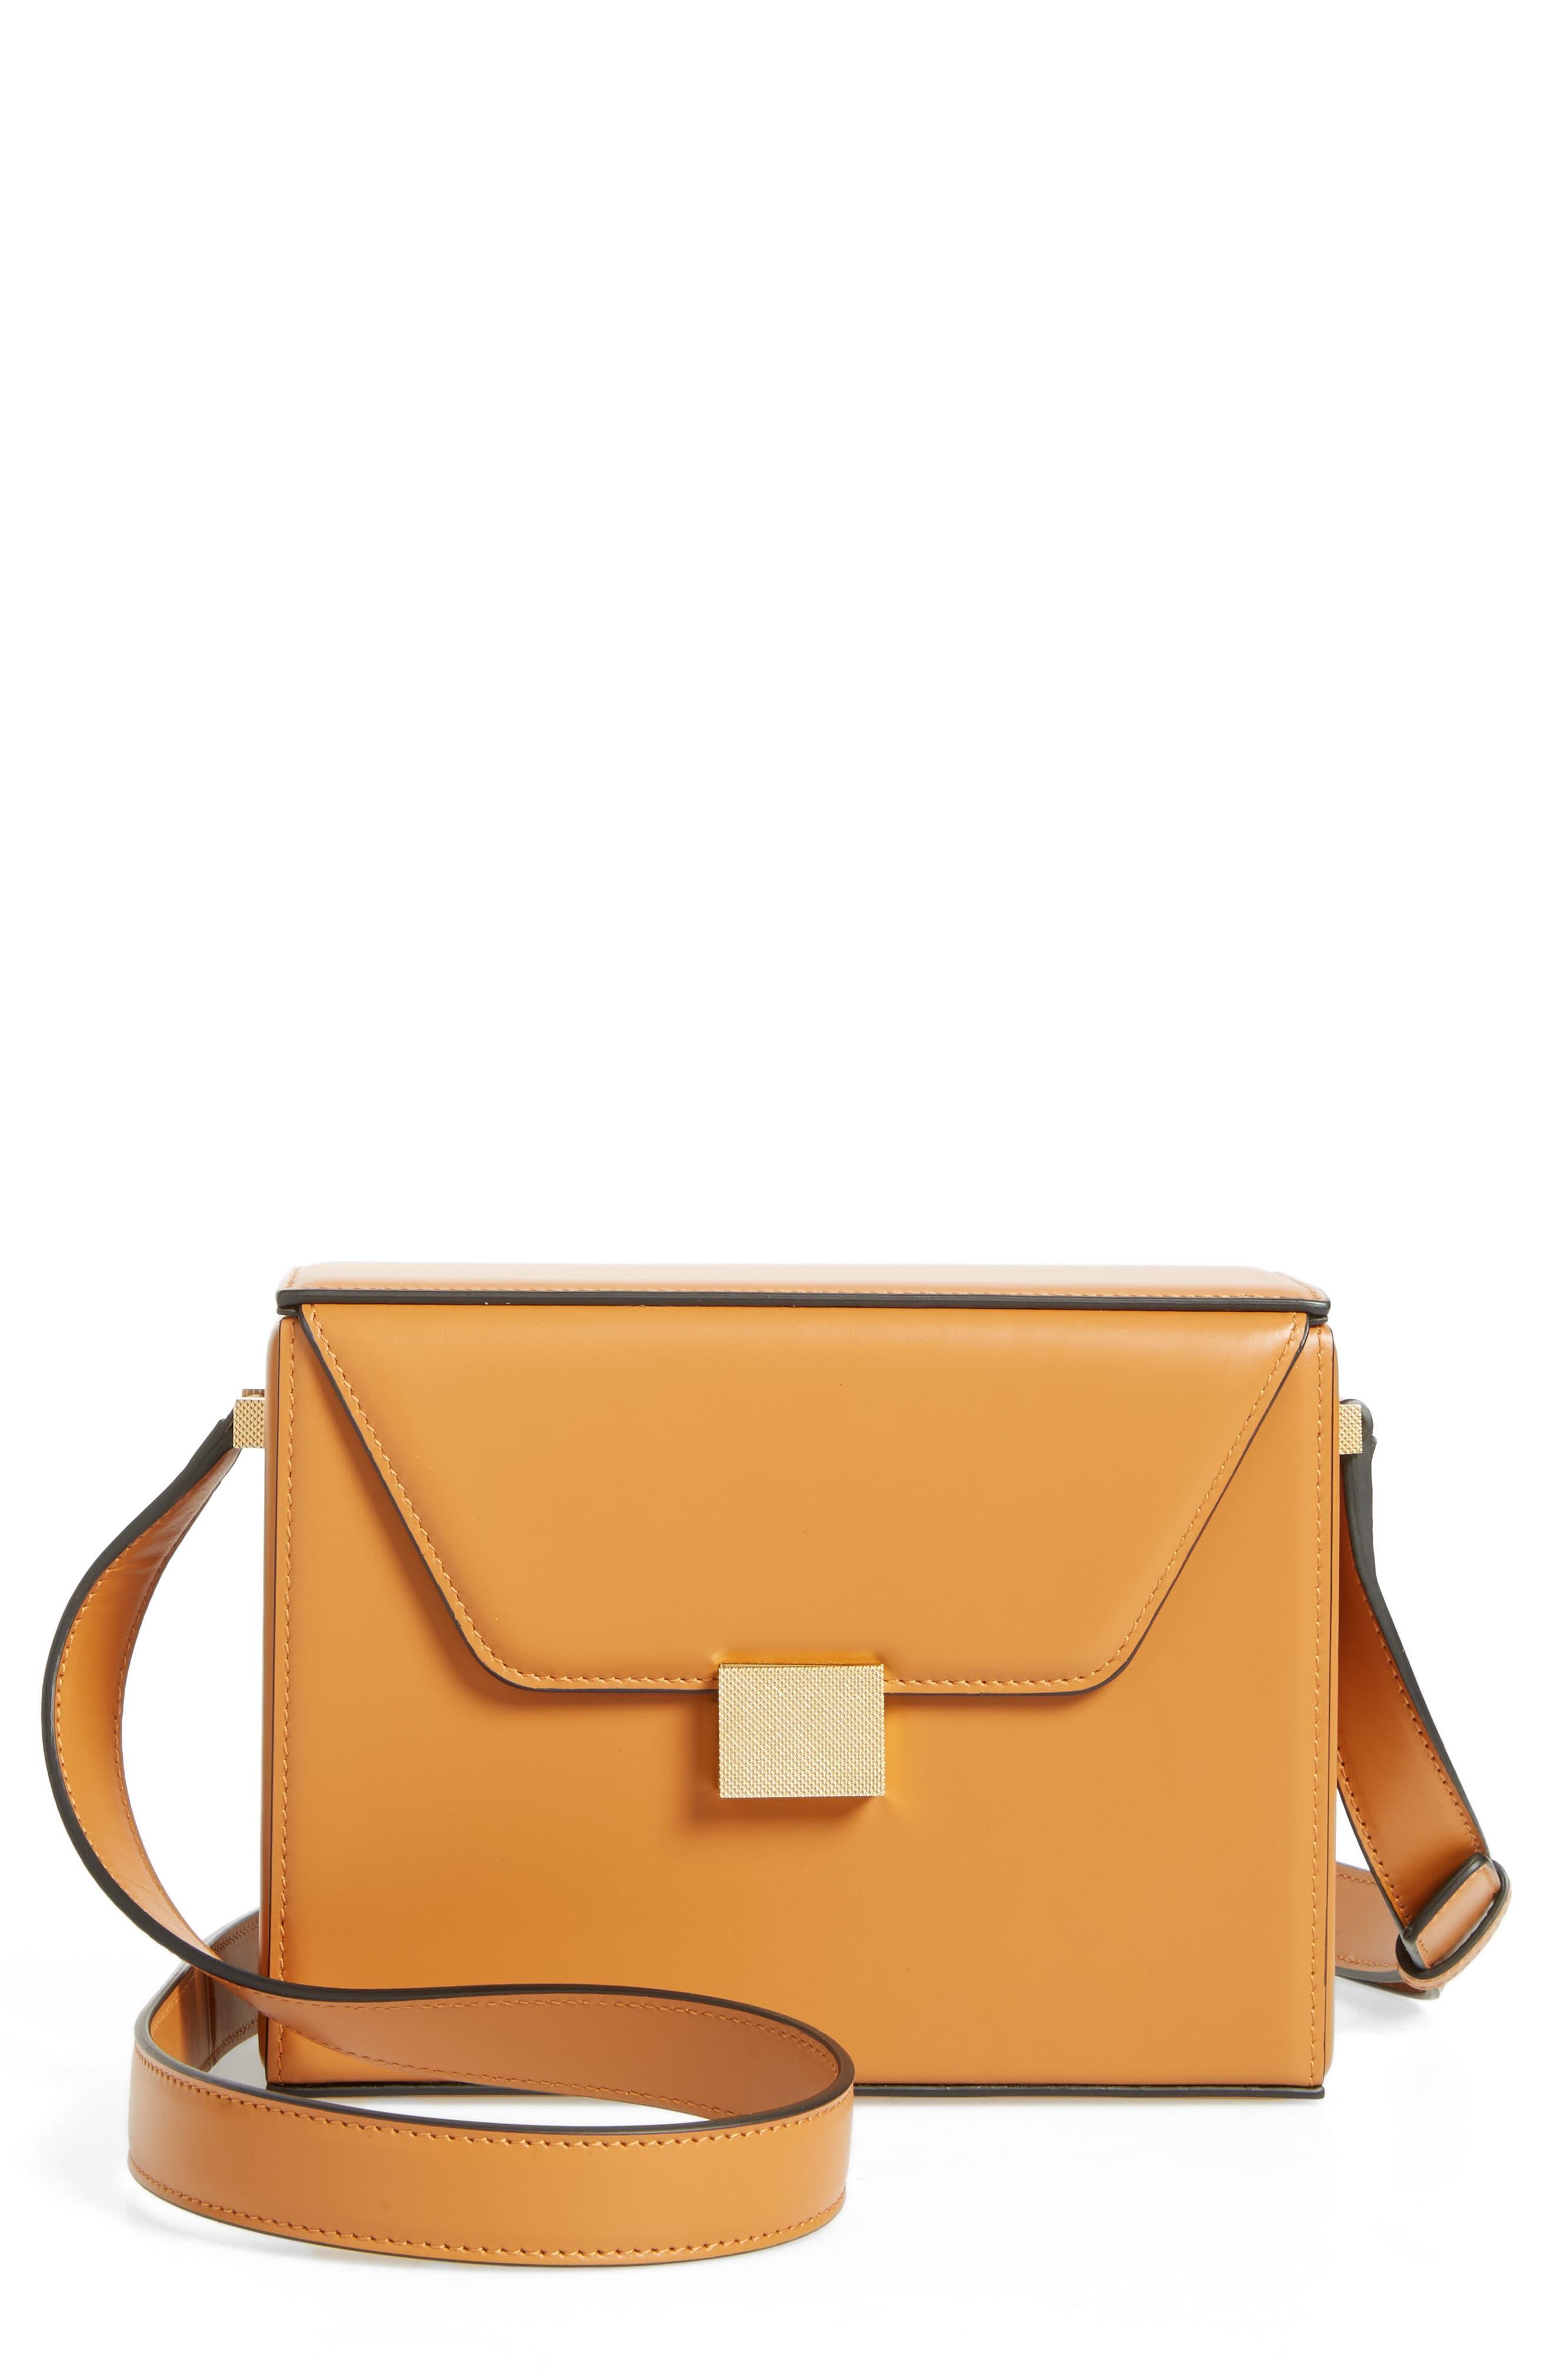 Vanity Calfskin Leather Box Bag,                             Main thumbnail 1, color,                             Mustard